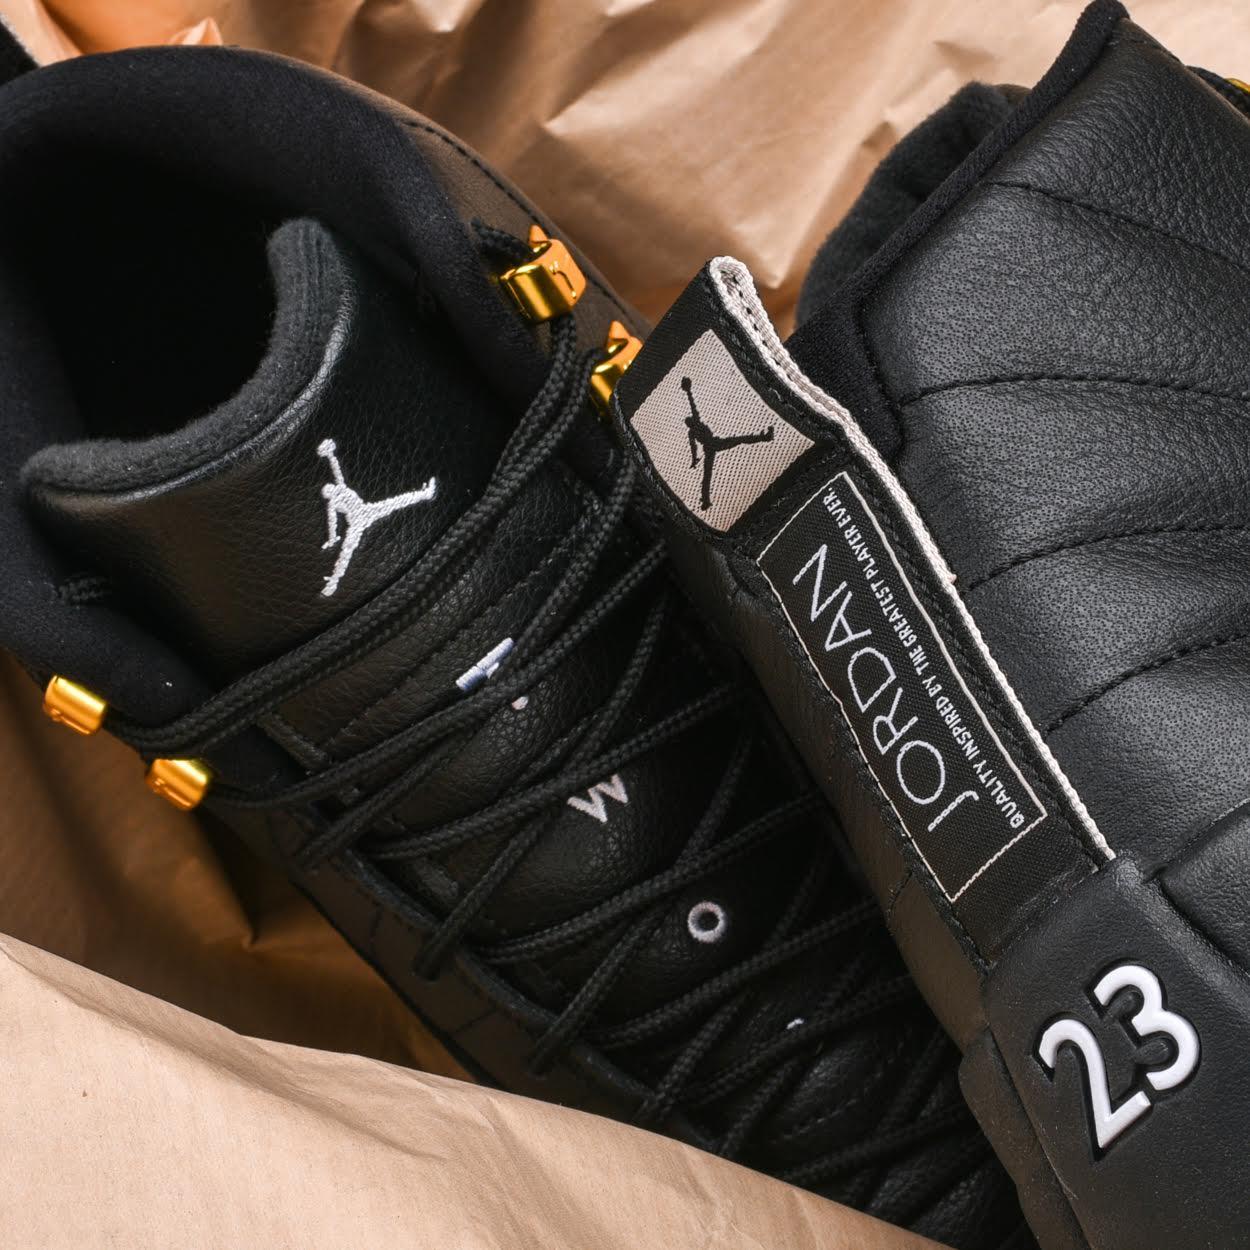 Get One Last Look at the Air Jordan 12 Retro 'The Master' 7